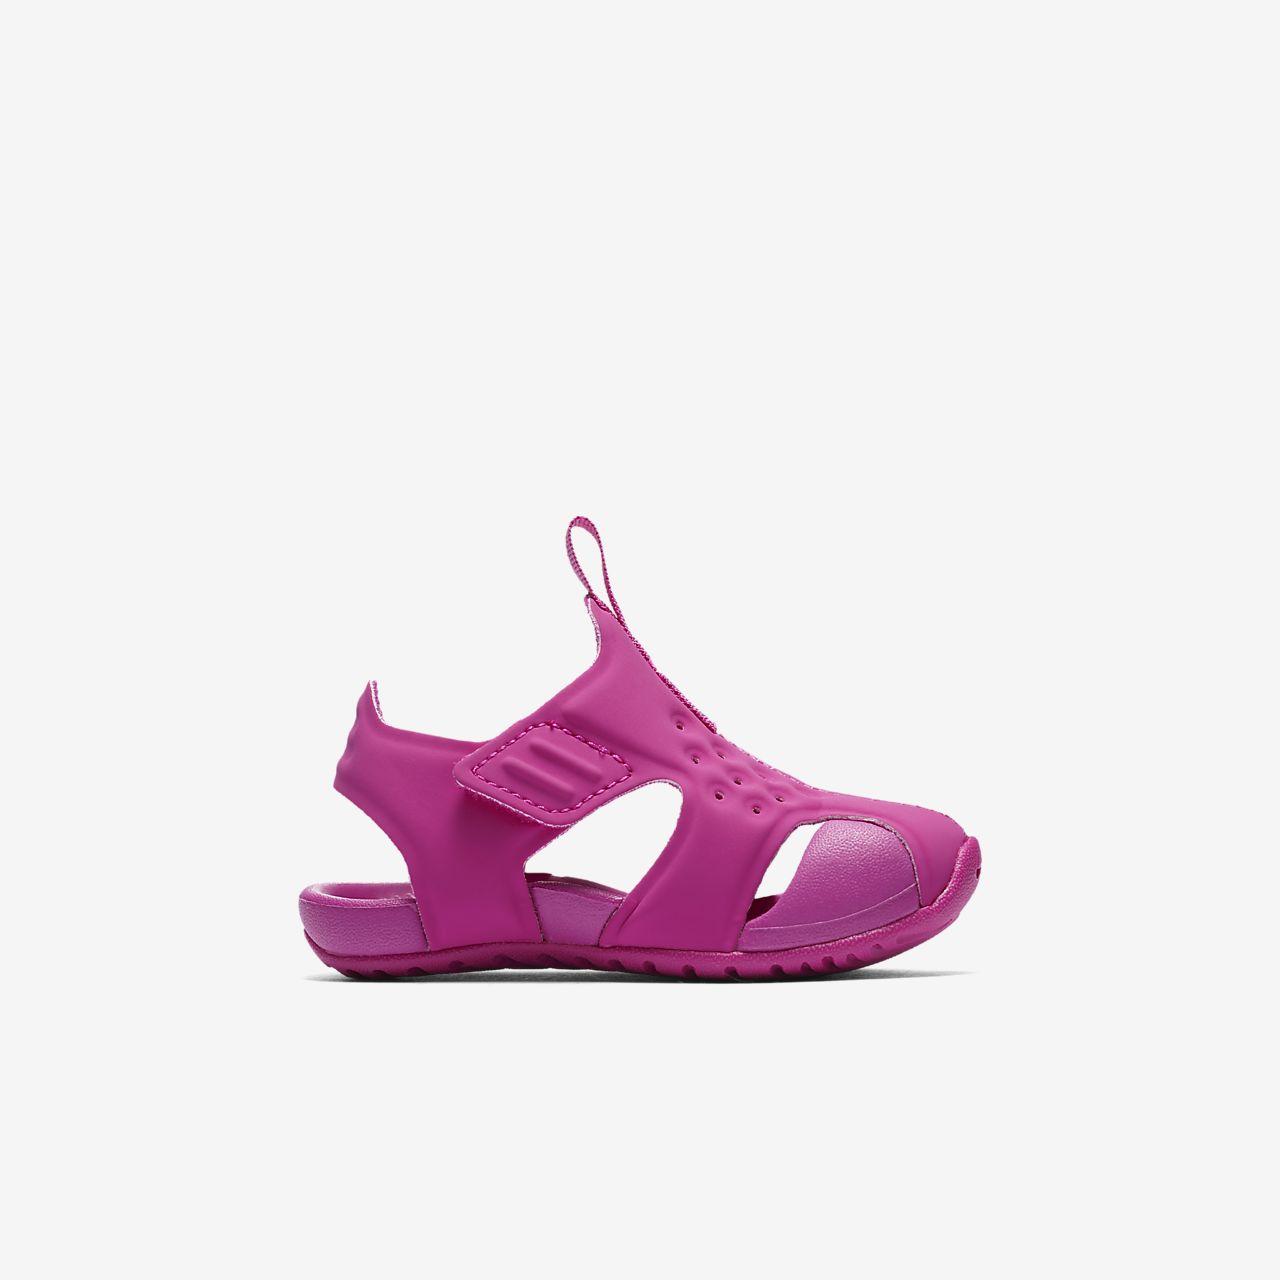 baa643e60 Nike Sunray Protect 2 Baby   Toddler Shoe. Nike.com ID